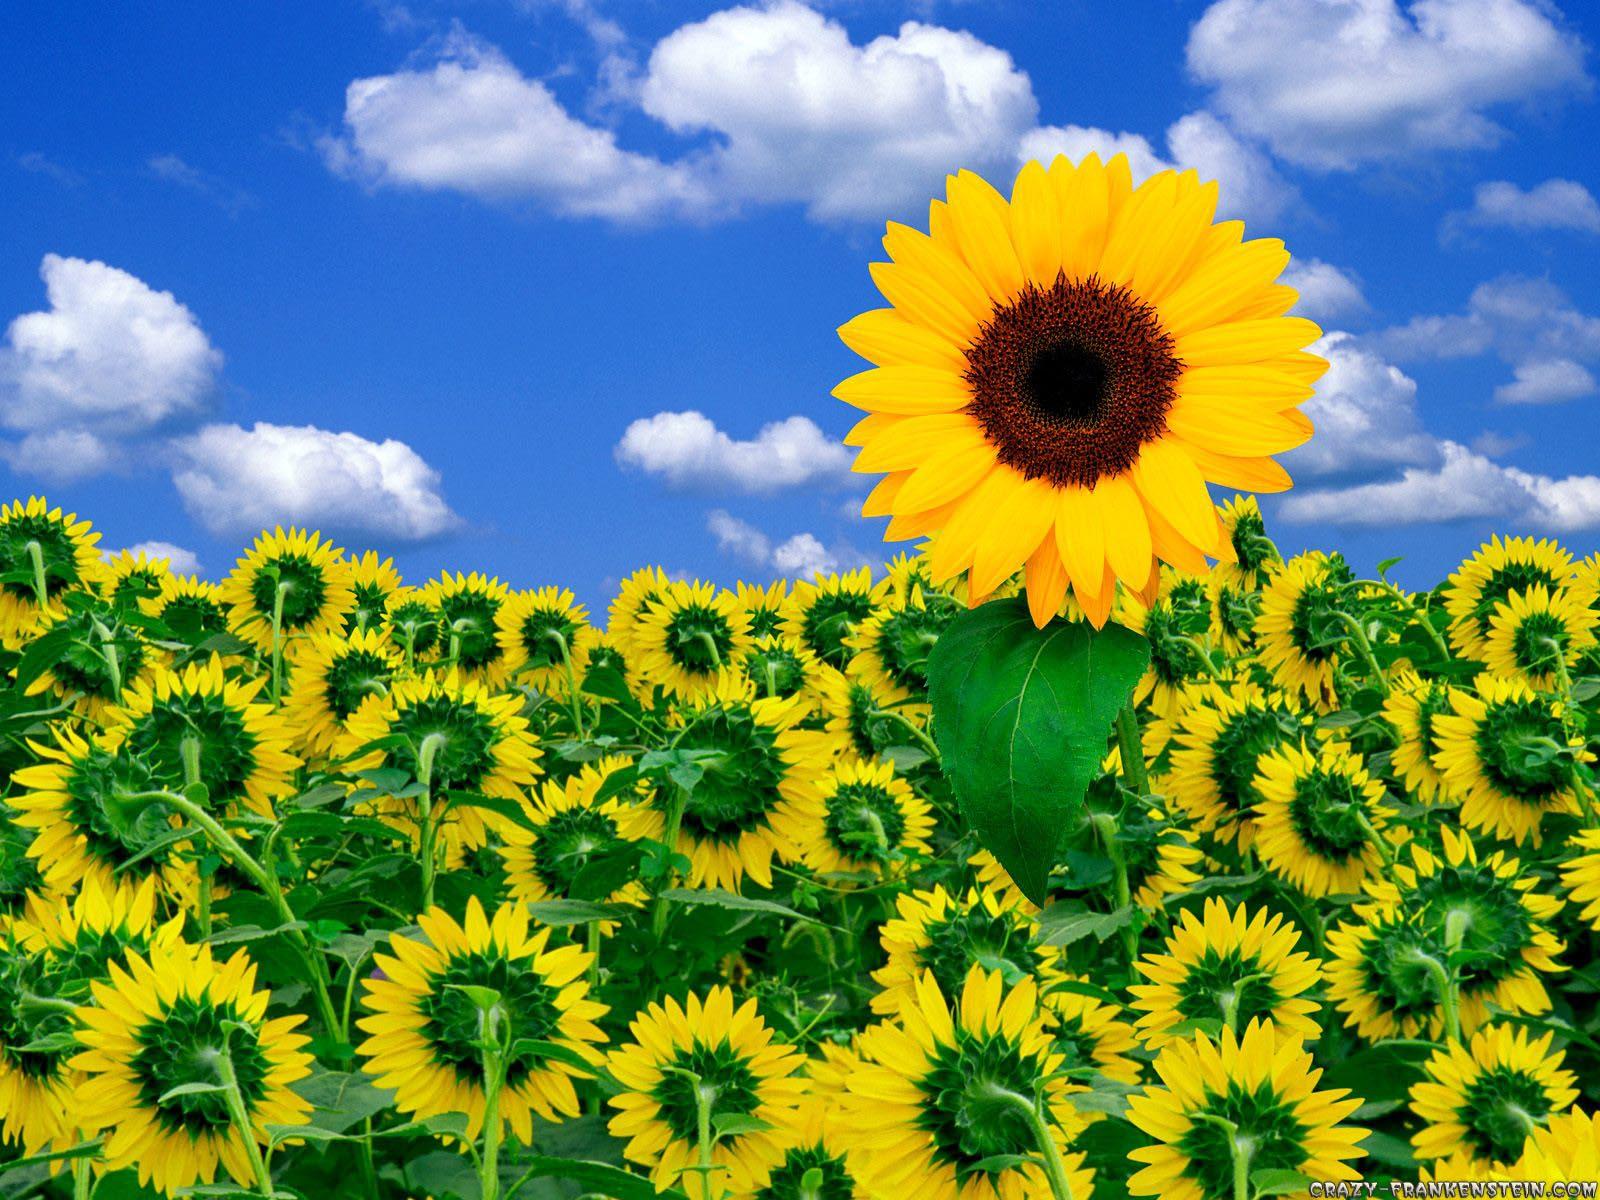 http://2.bp.blogspot.com/-F5ZZkkvY8m8/T2SErZPqiTI/AAAAAAAADP4/_-265FiJJ4Q/s1600/sunshine-wallpaper-4-755666.jpg